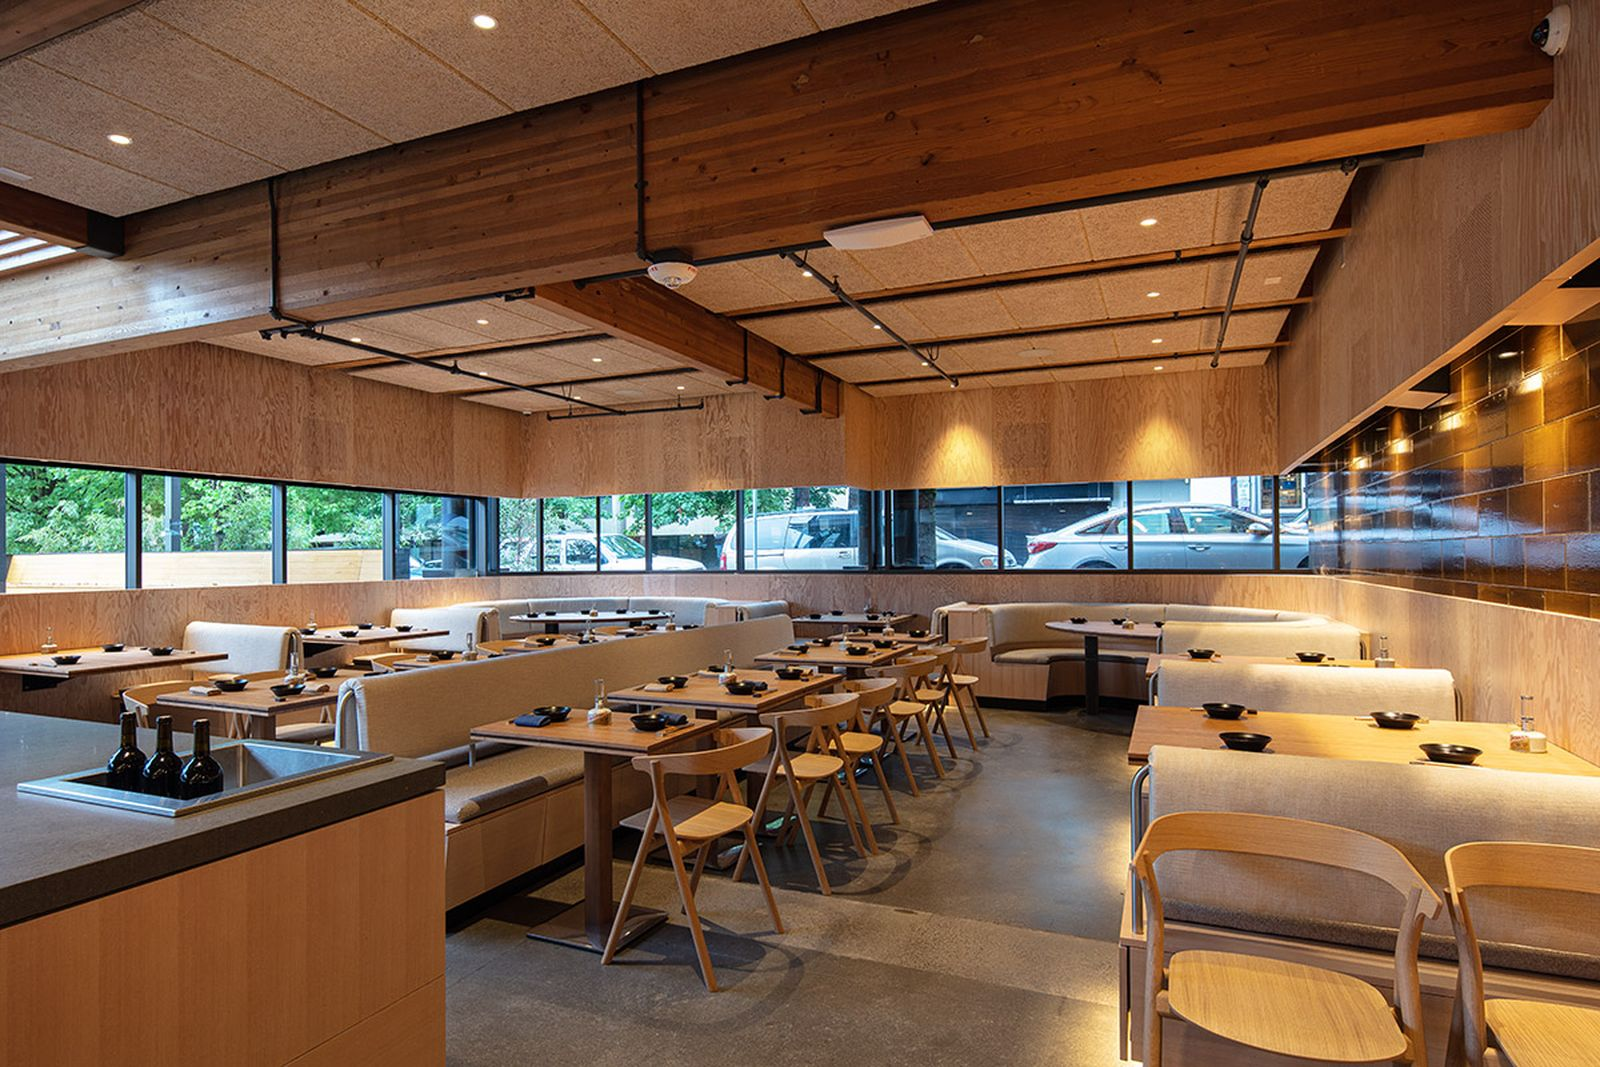 snow-peaks-first-ever-restaurant-looks-as-good-as-it-tastes-014